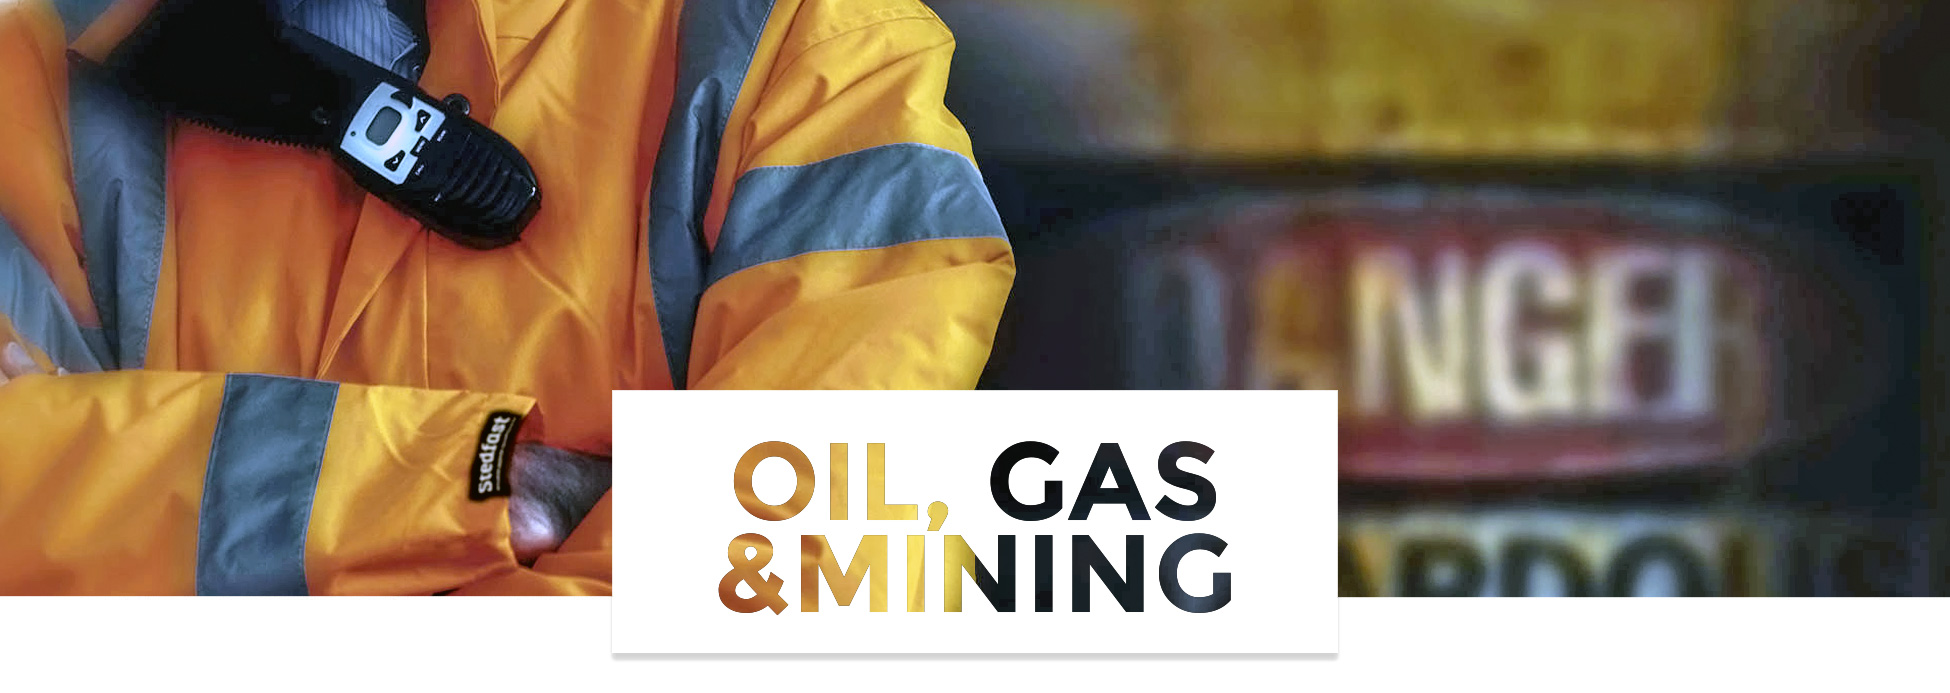 Oil, Gas, Mining